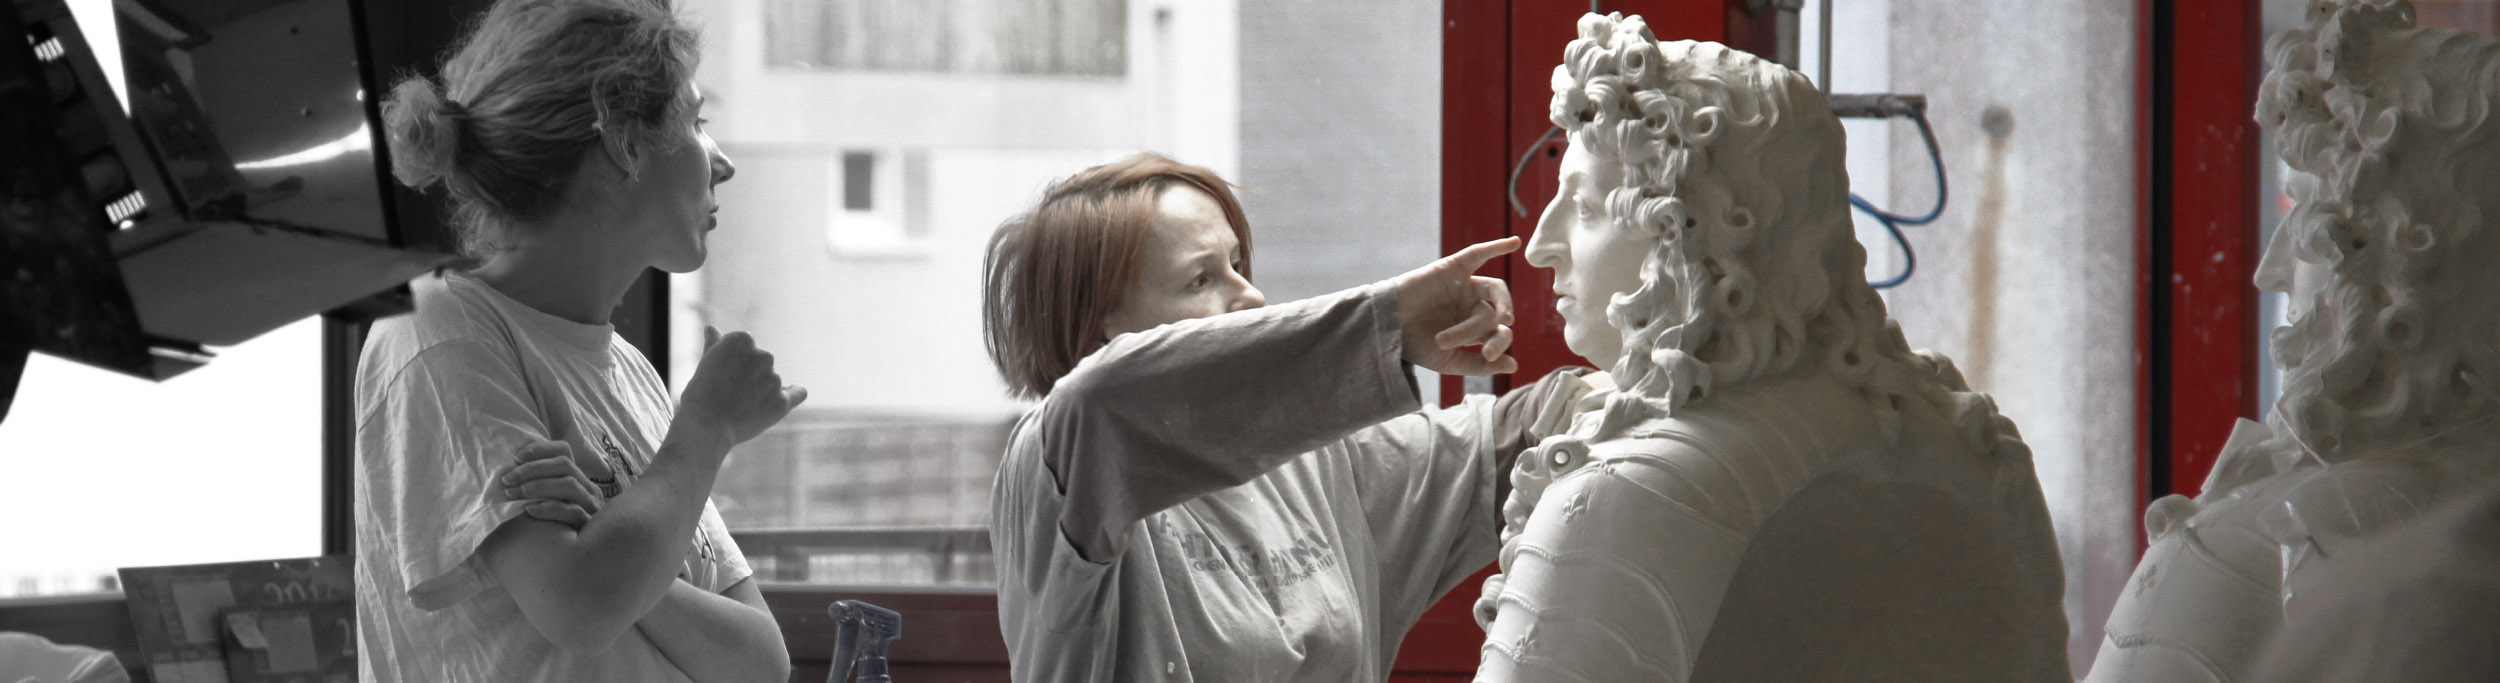 Have a custom copy of a sculpture made to order - Atelier de moulages du Louvre